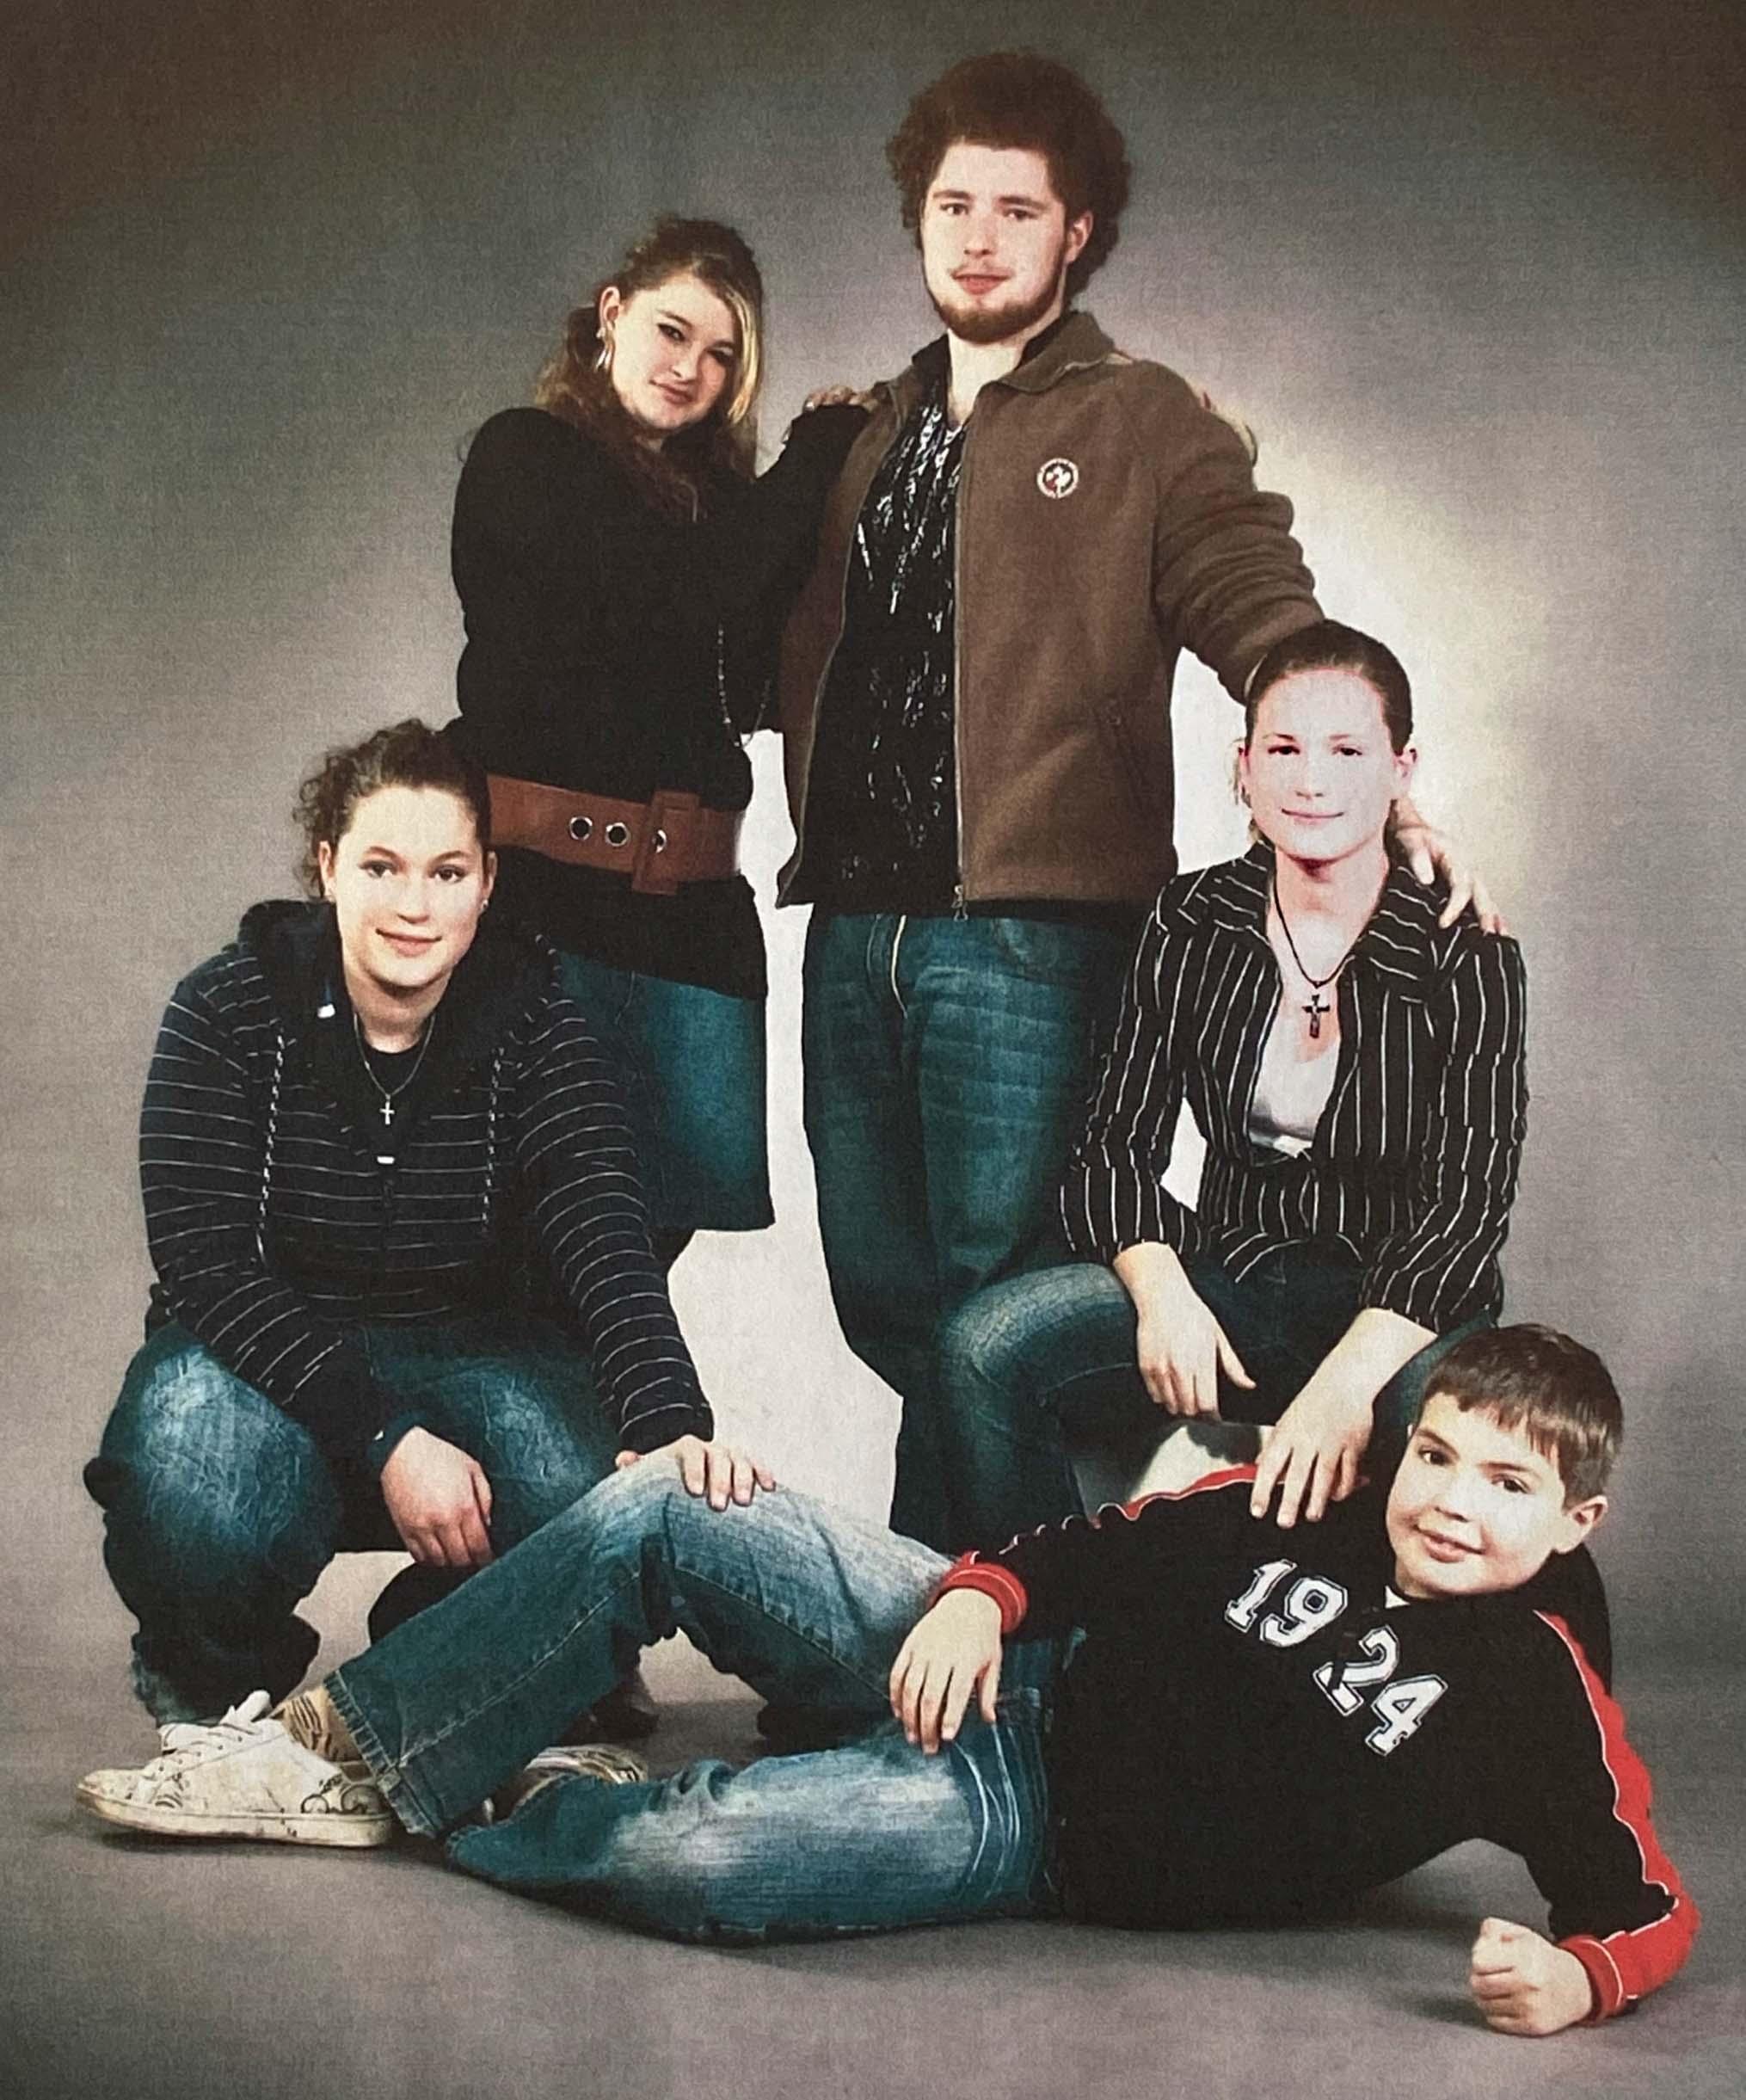 Andrea, Maria, Martin, Monika, Benedikt Wiegandt - 2004